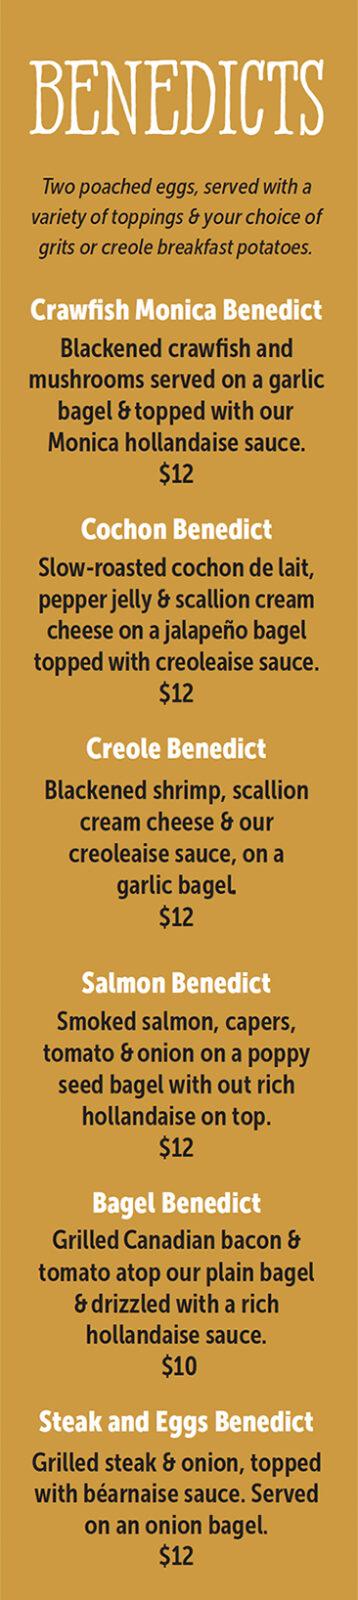 benedicts menu